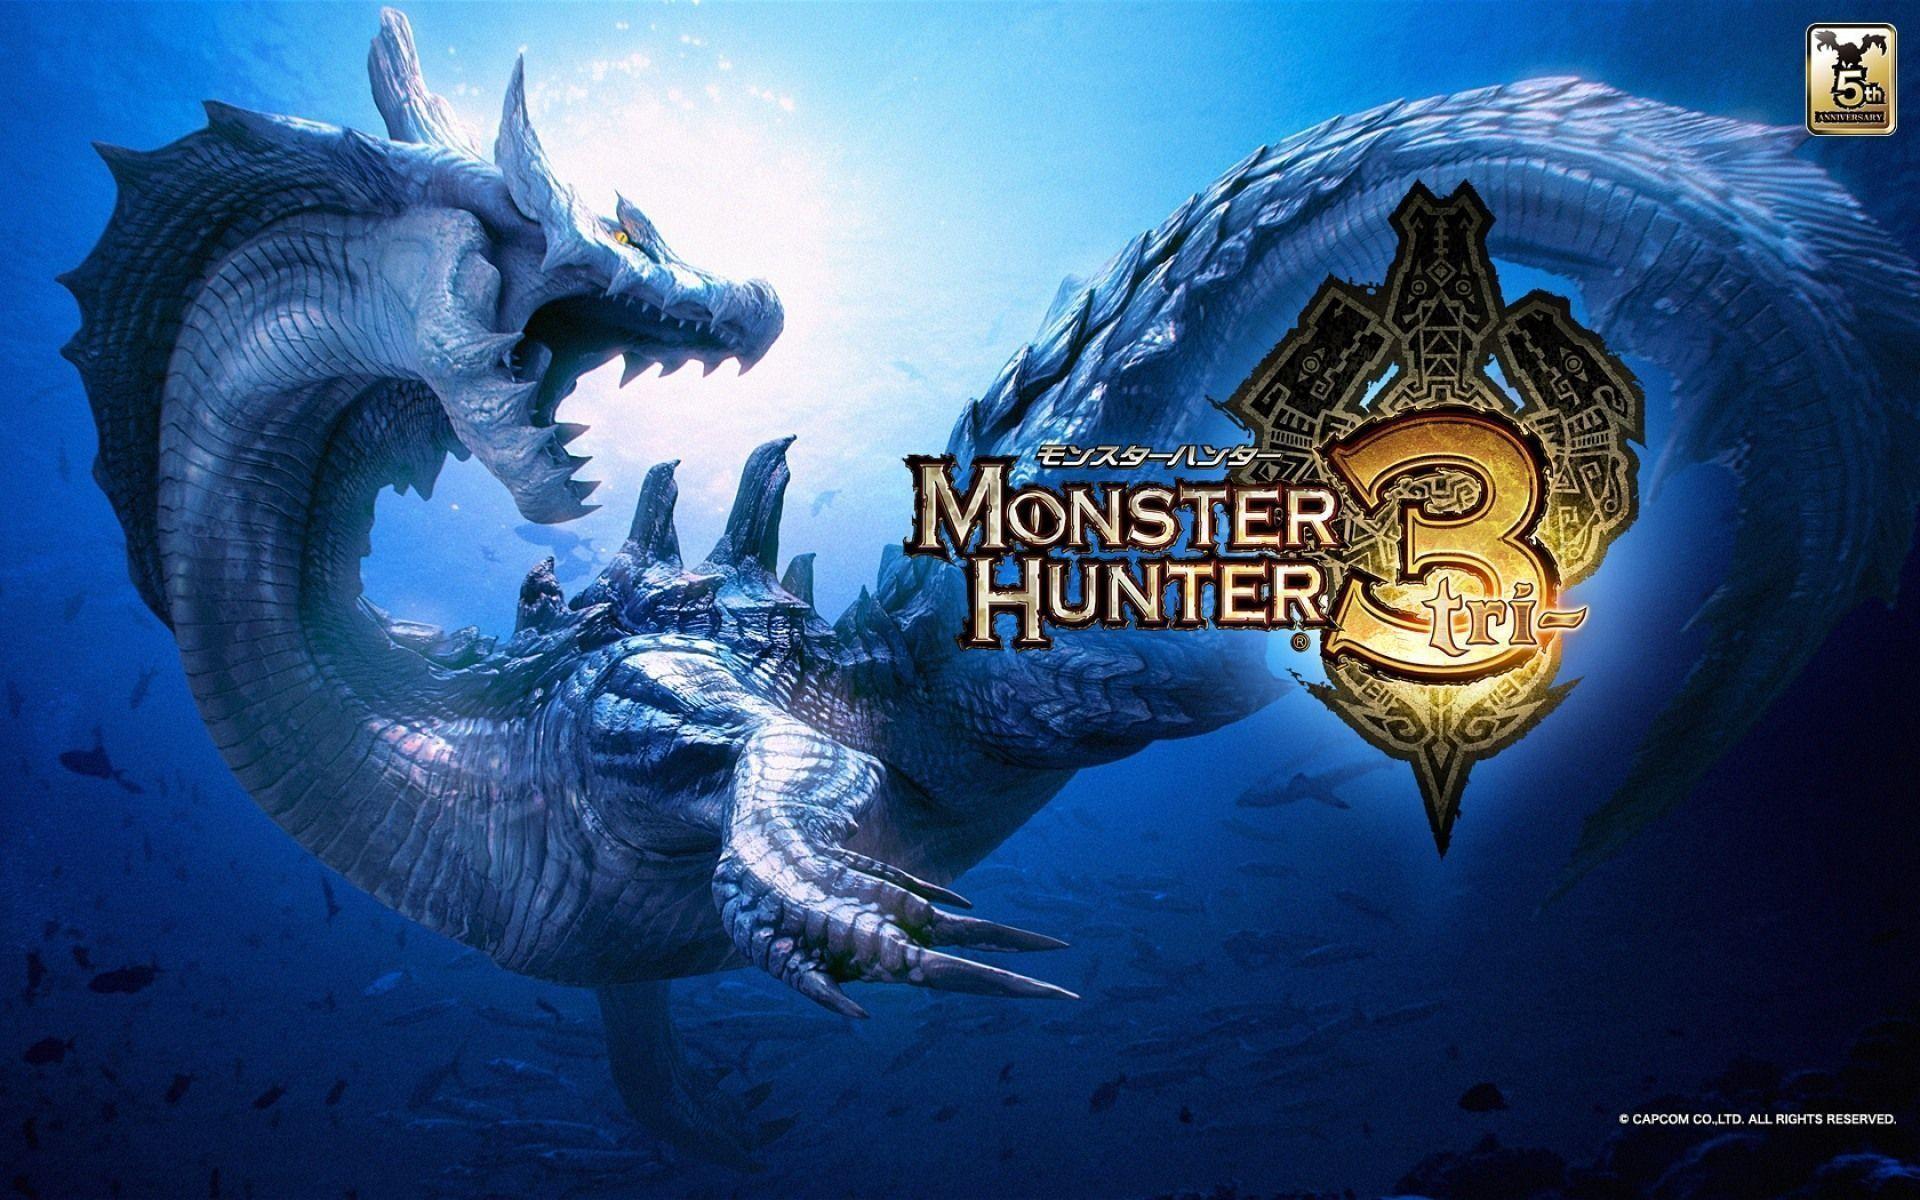 Monster Hunter Tri Wallpaper Wallpapertag